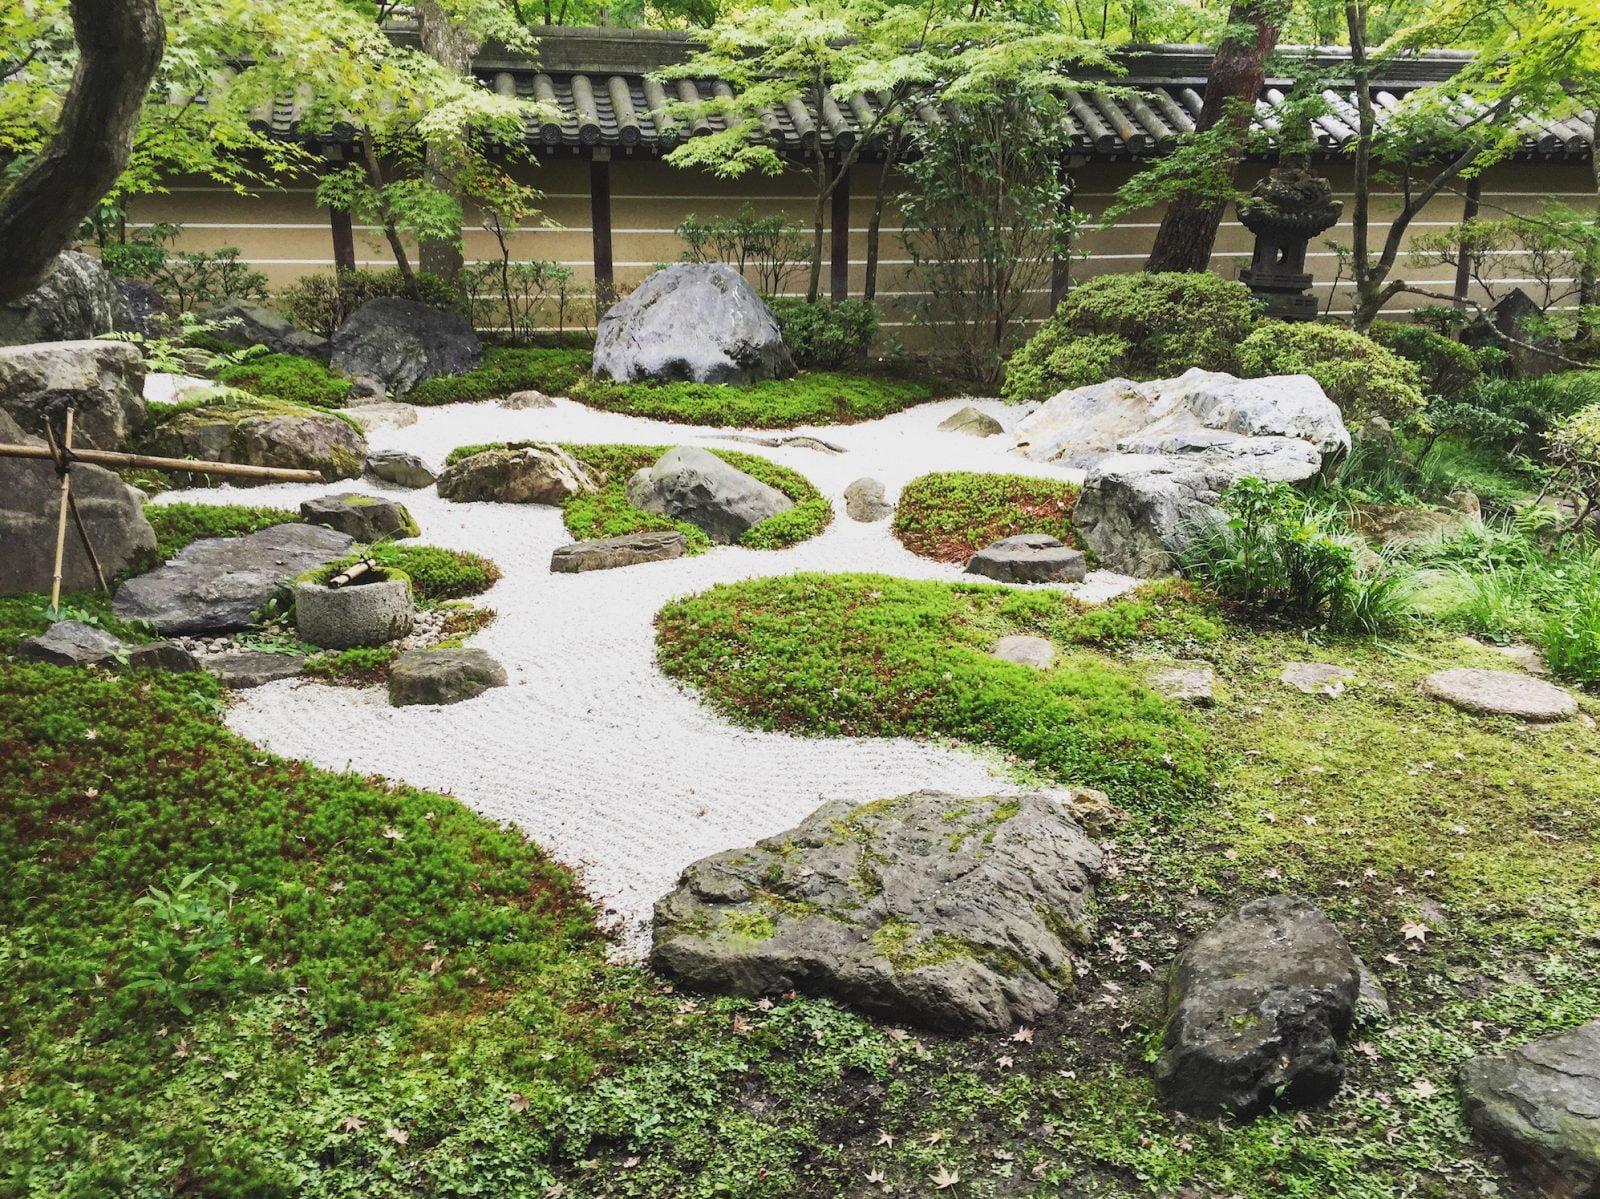 Japonlara Özgü Harika Kavramlar : Top 5